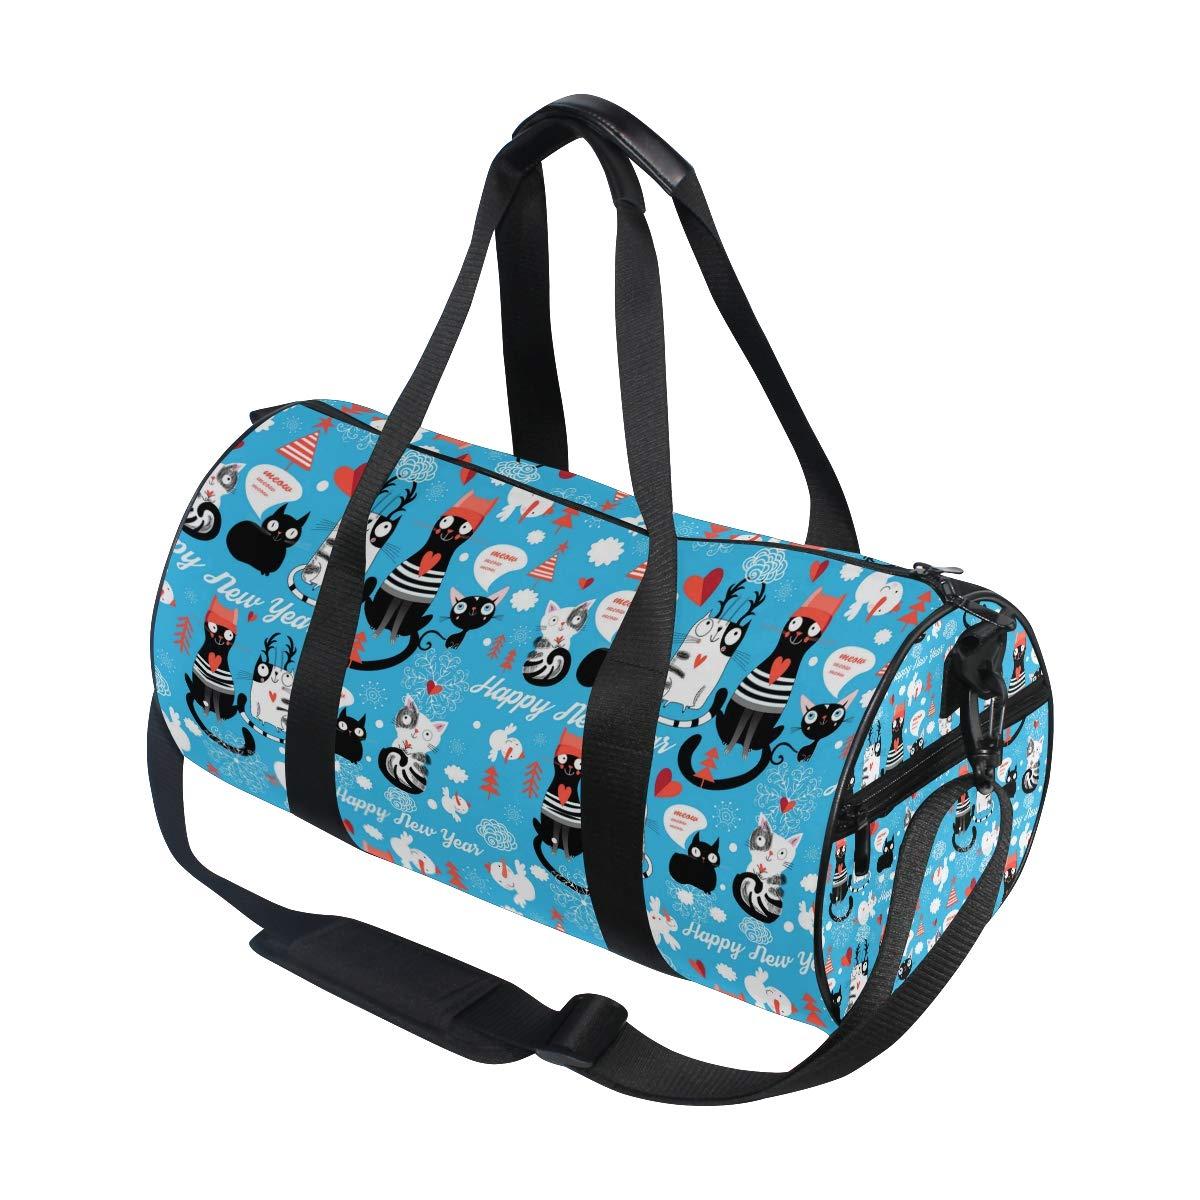 Black Cat Christmas Dress Popular casual fitness bag,Non-Slip Wearable Crossbody Bag Waterproof Shoulder Bag.